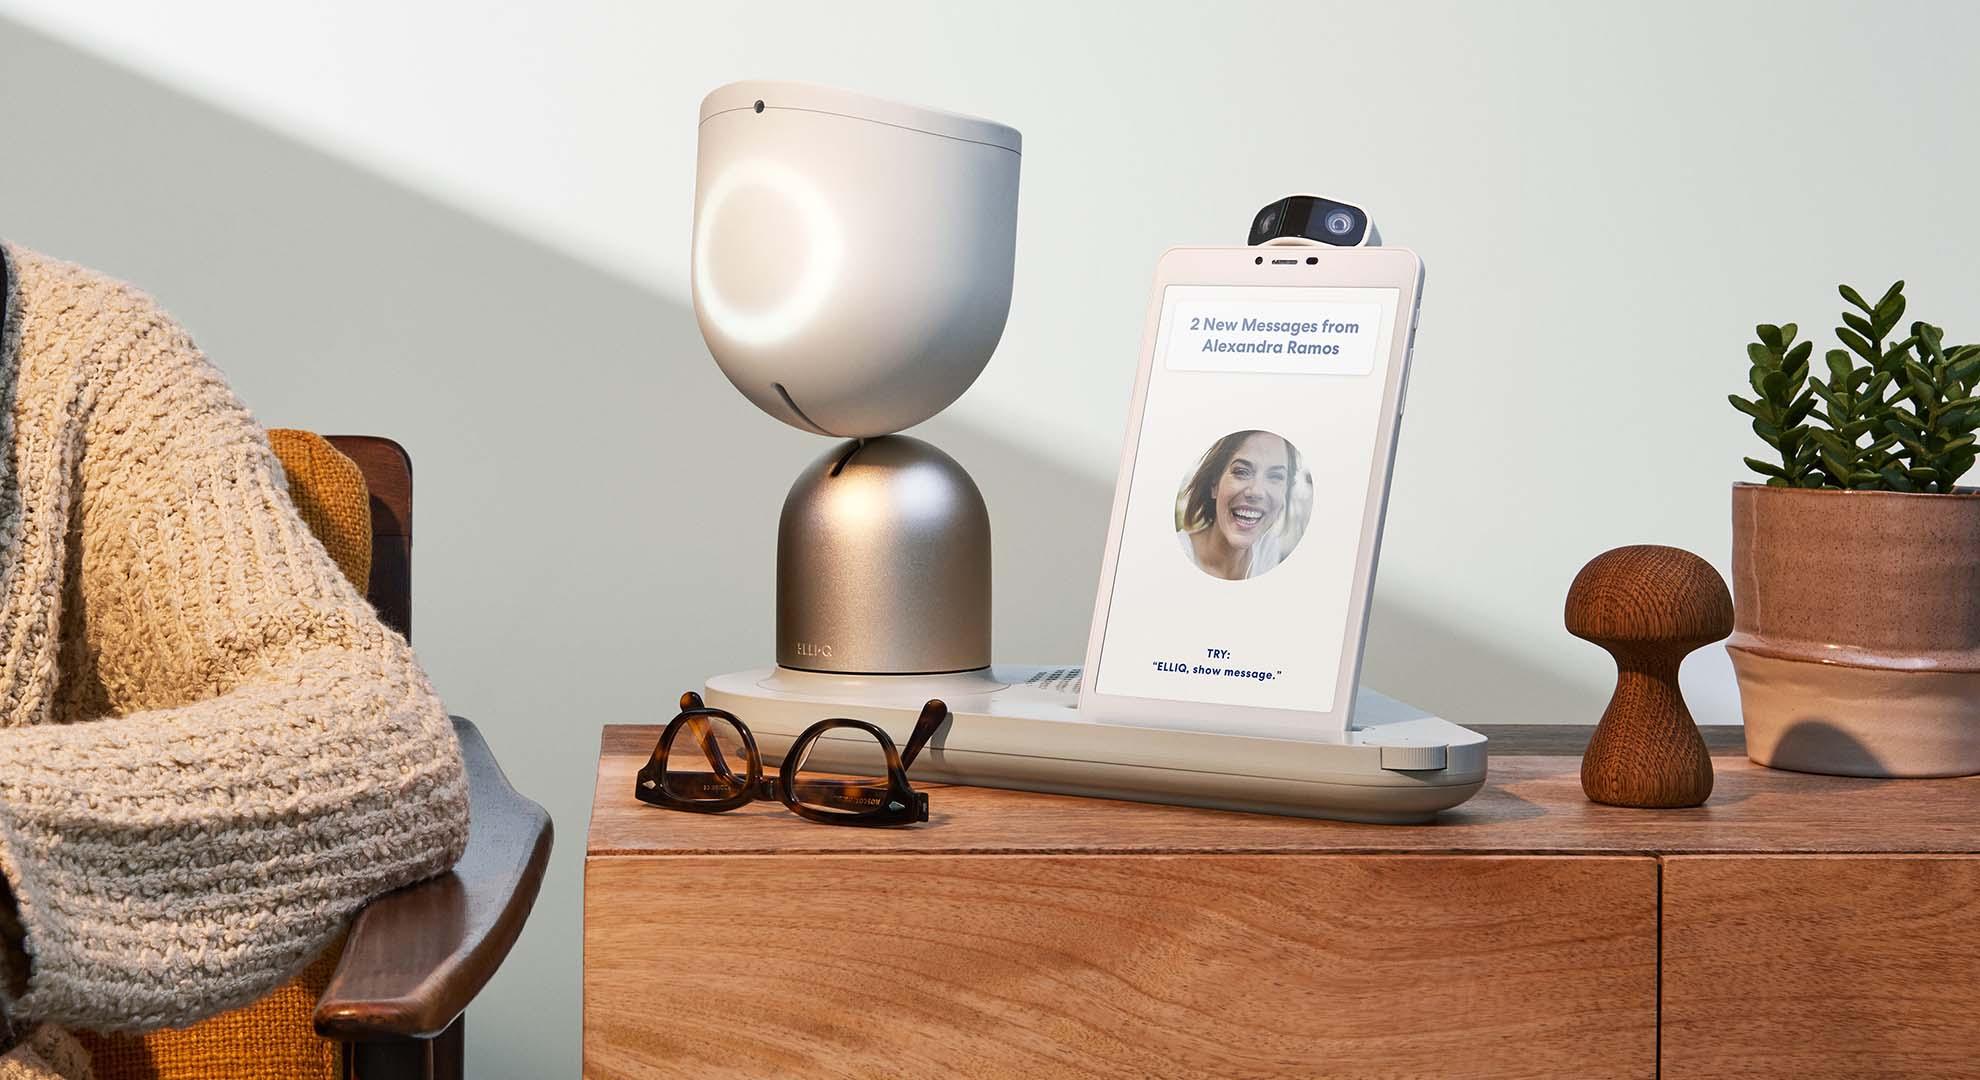 ElliQ social companion robot for the ageing population